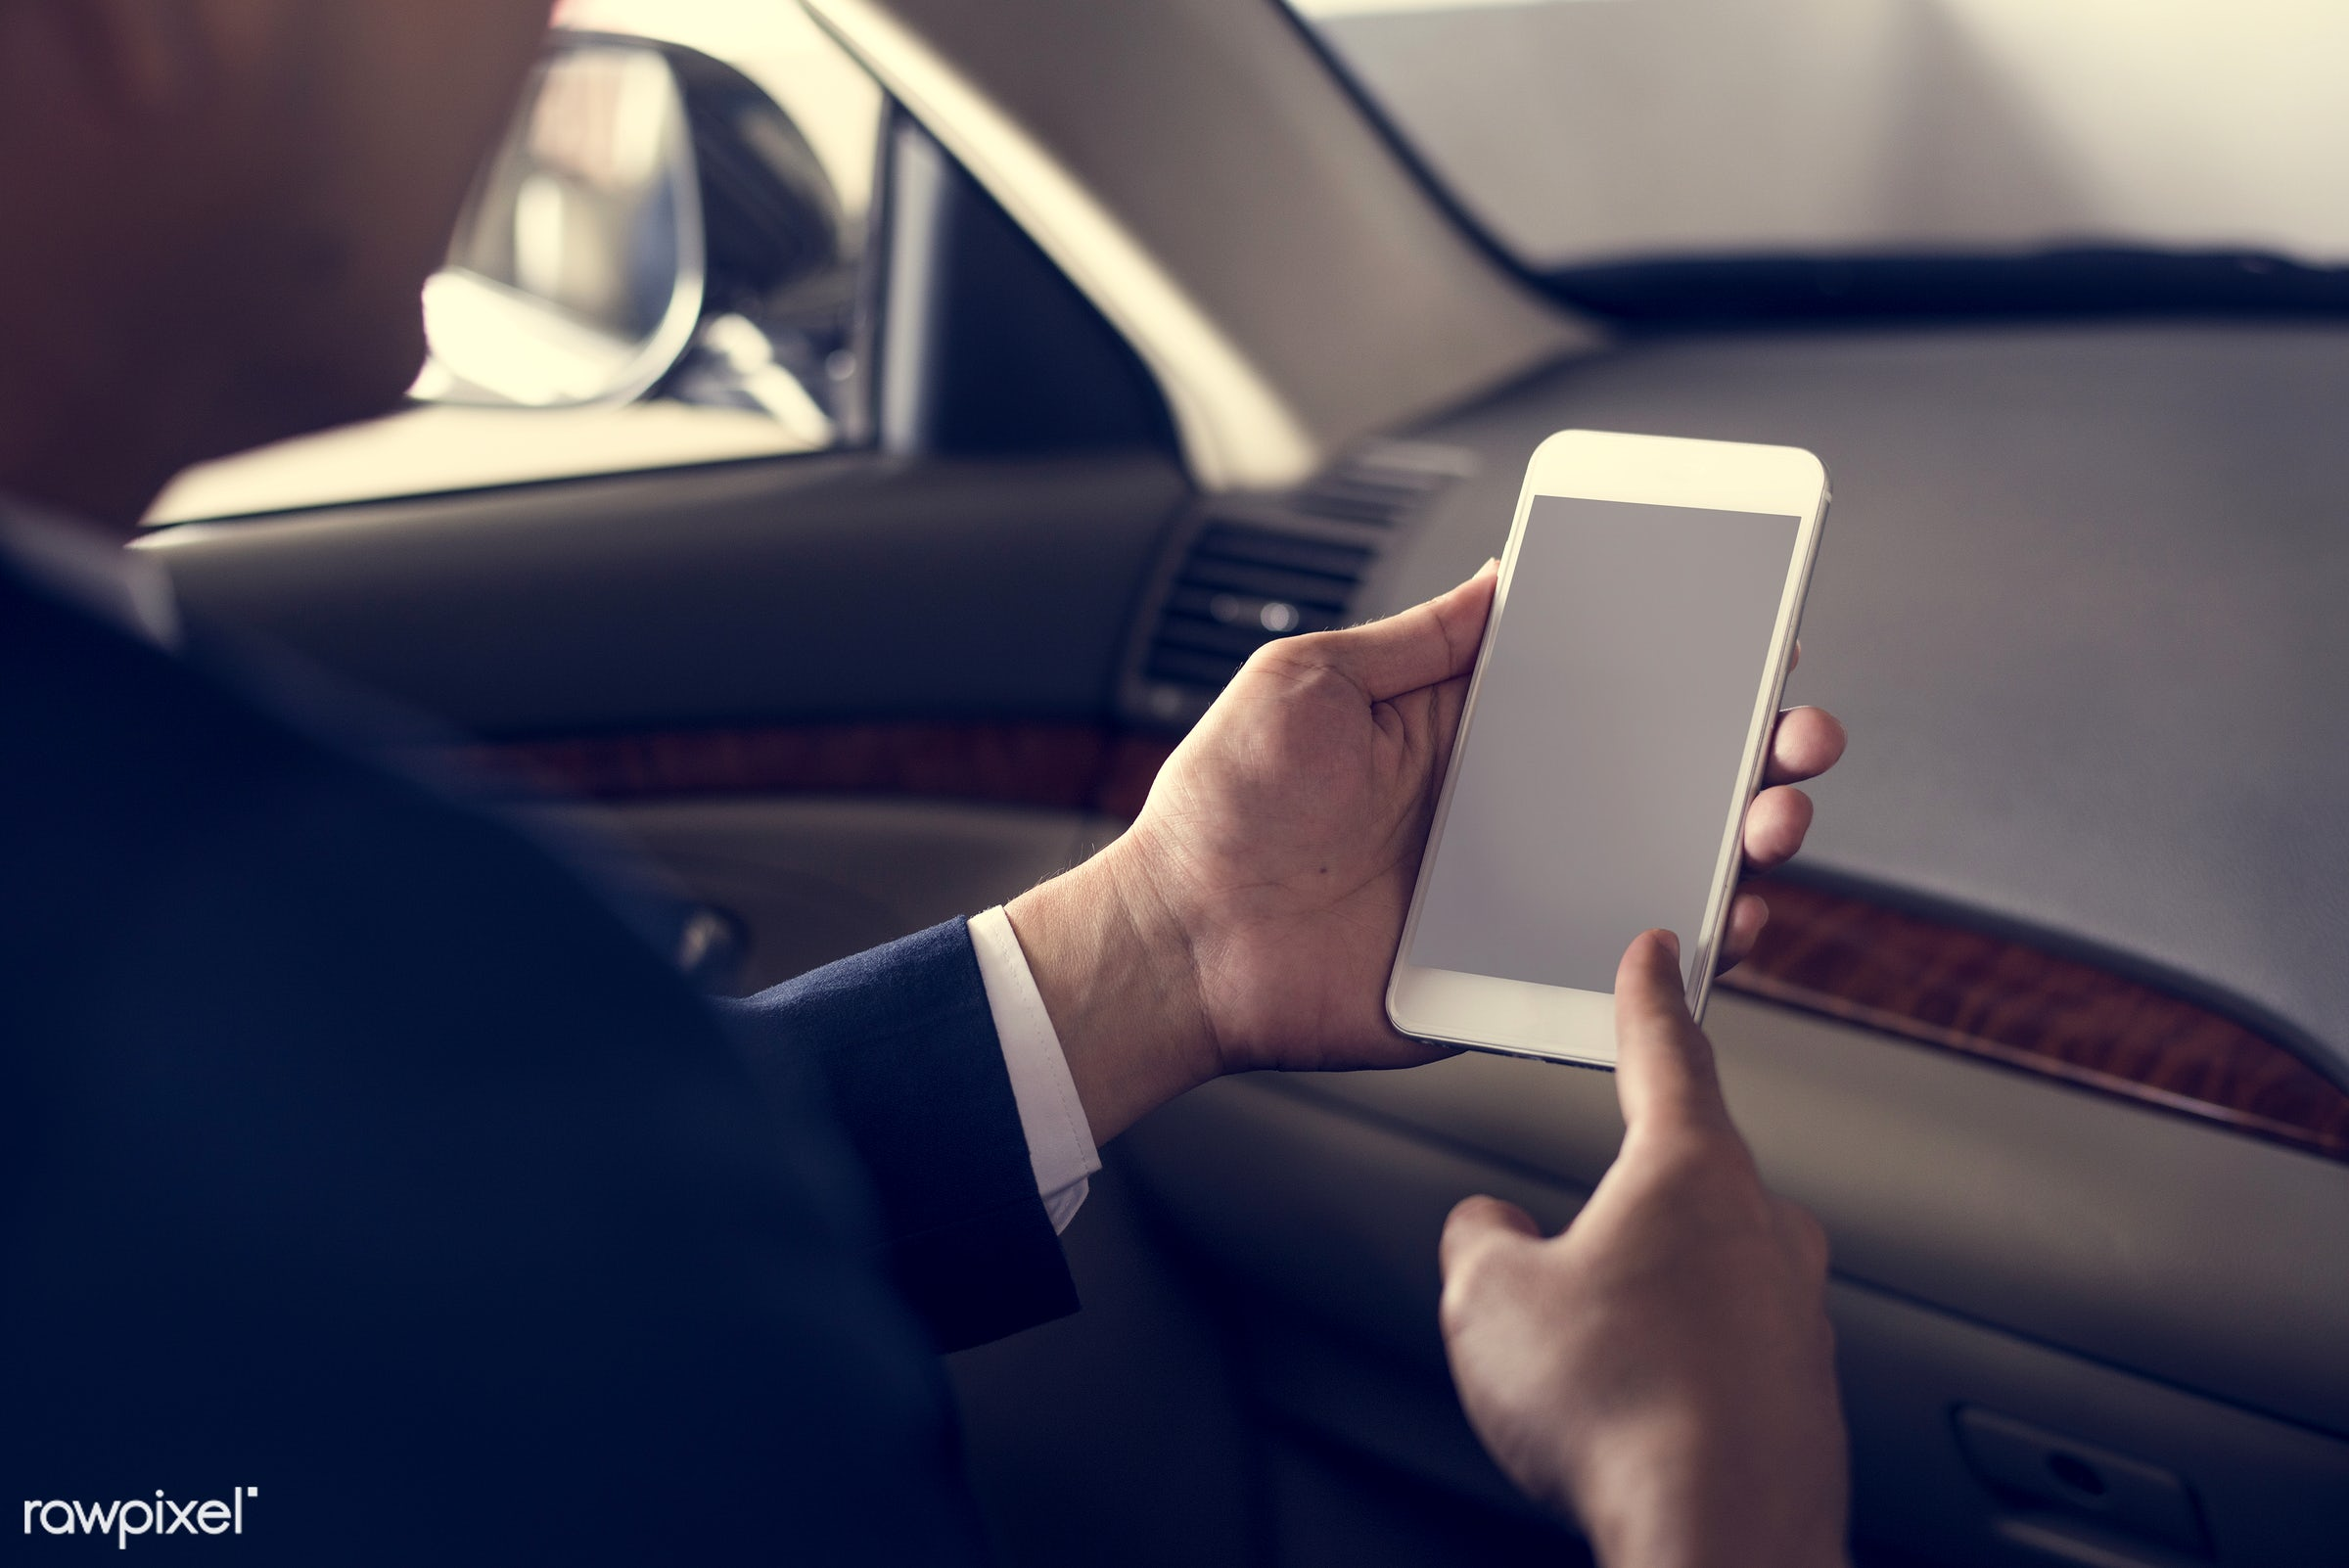 adult, back seat, blank, business, businessman, businessmen, candid, car, cellphone, colleague, communication, copy space,...